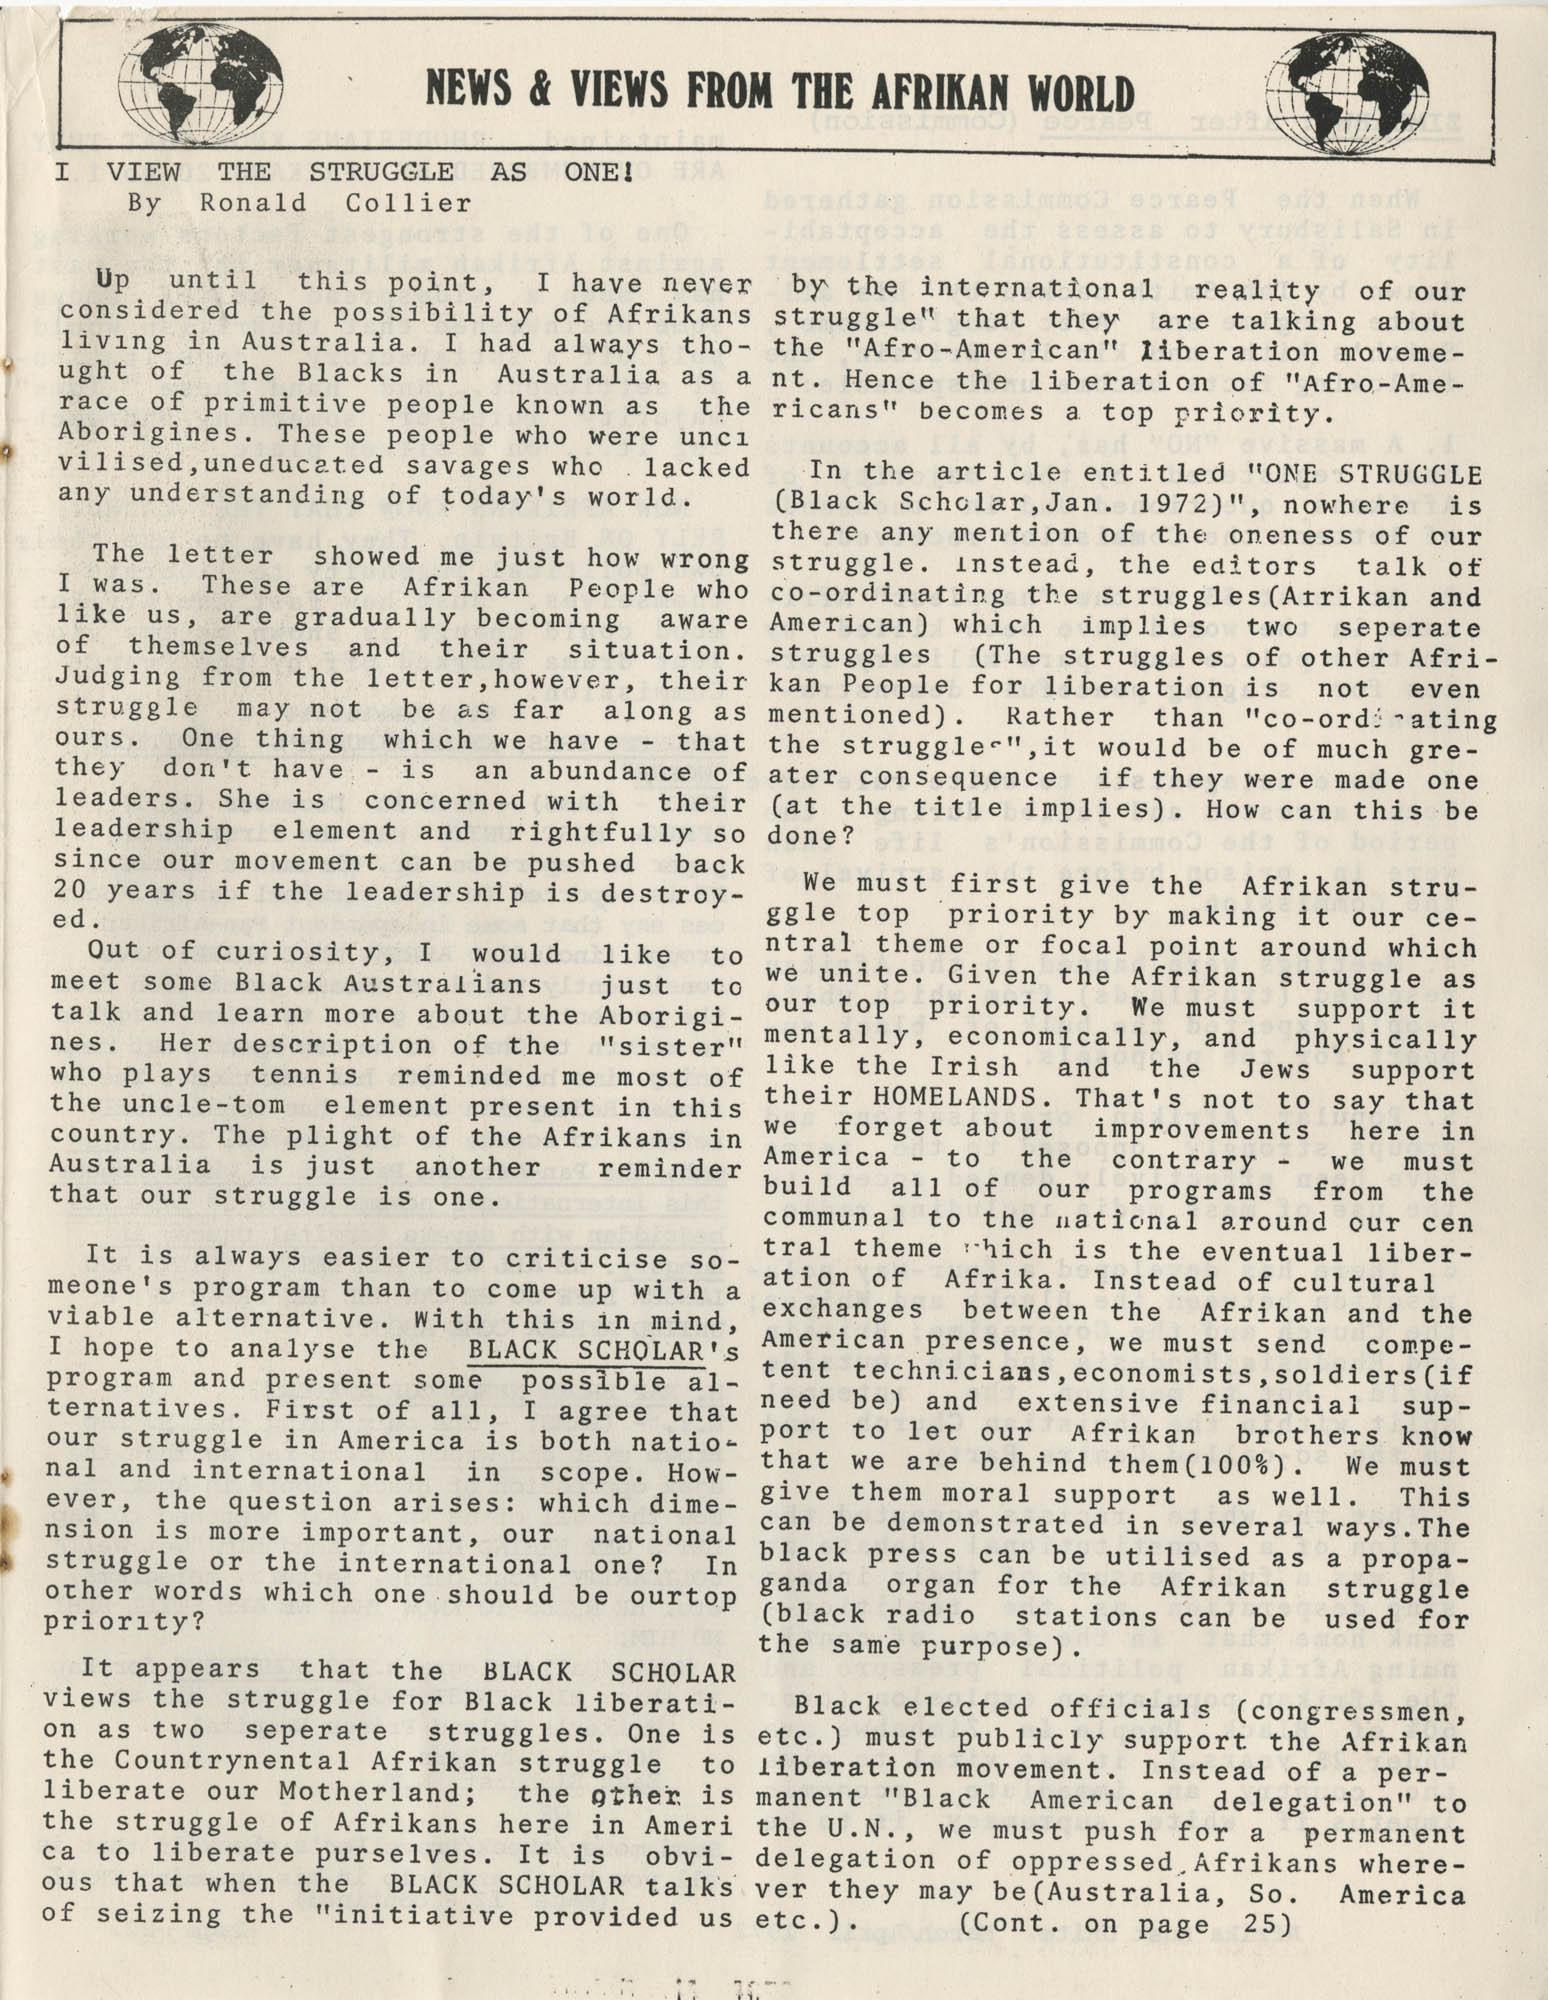 Afrika Must Unite, Vol. 1, No. 4, Page 21